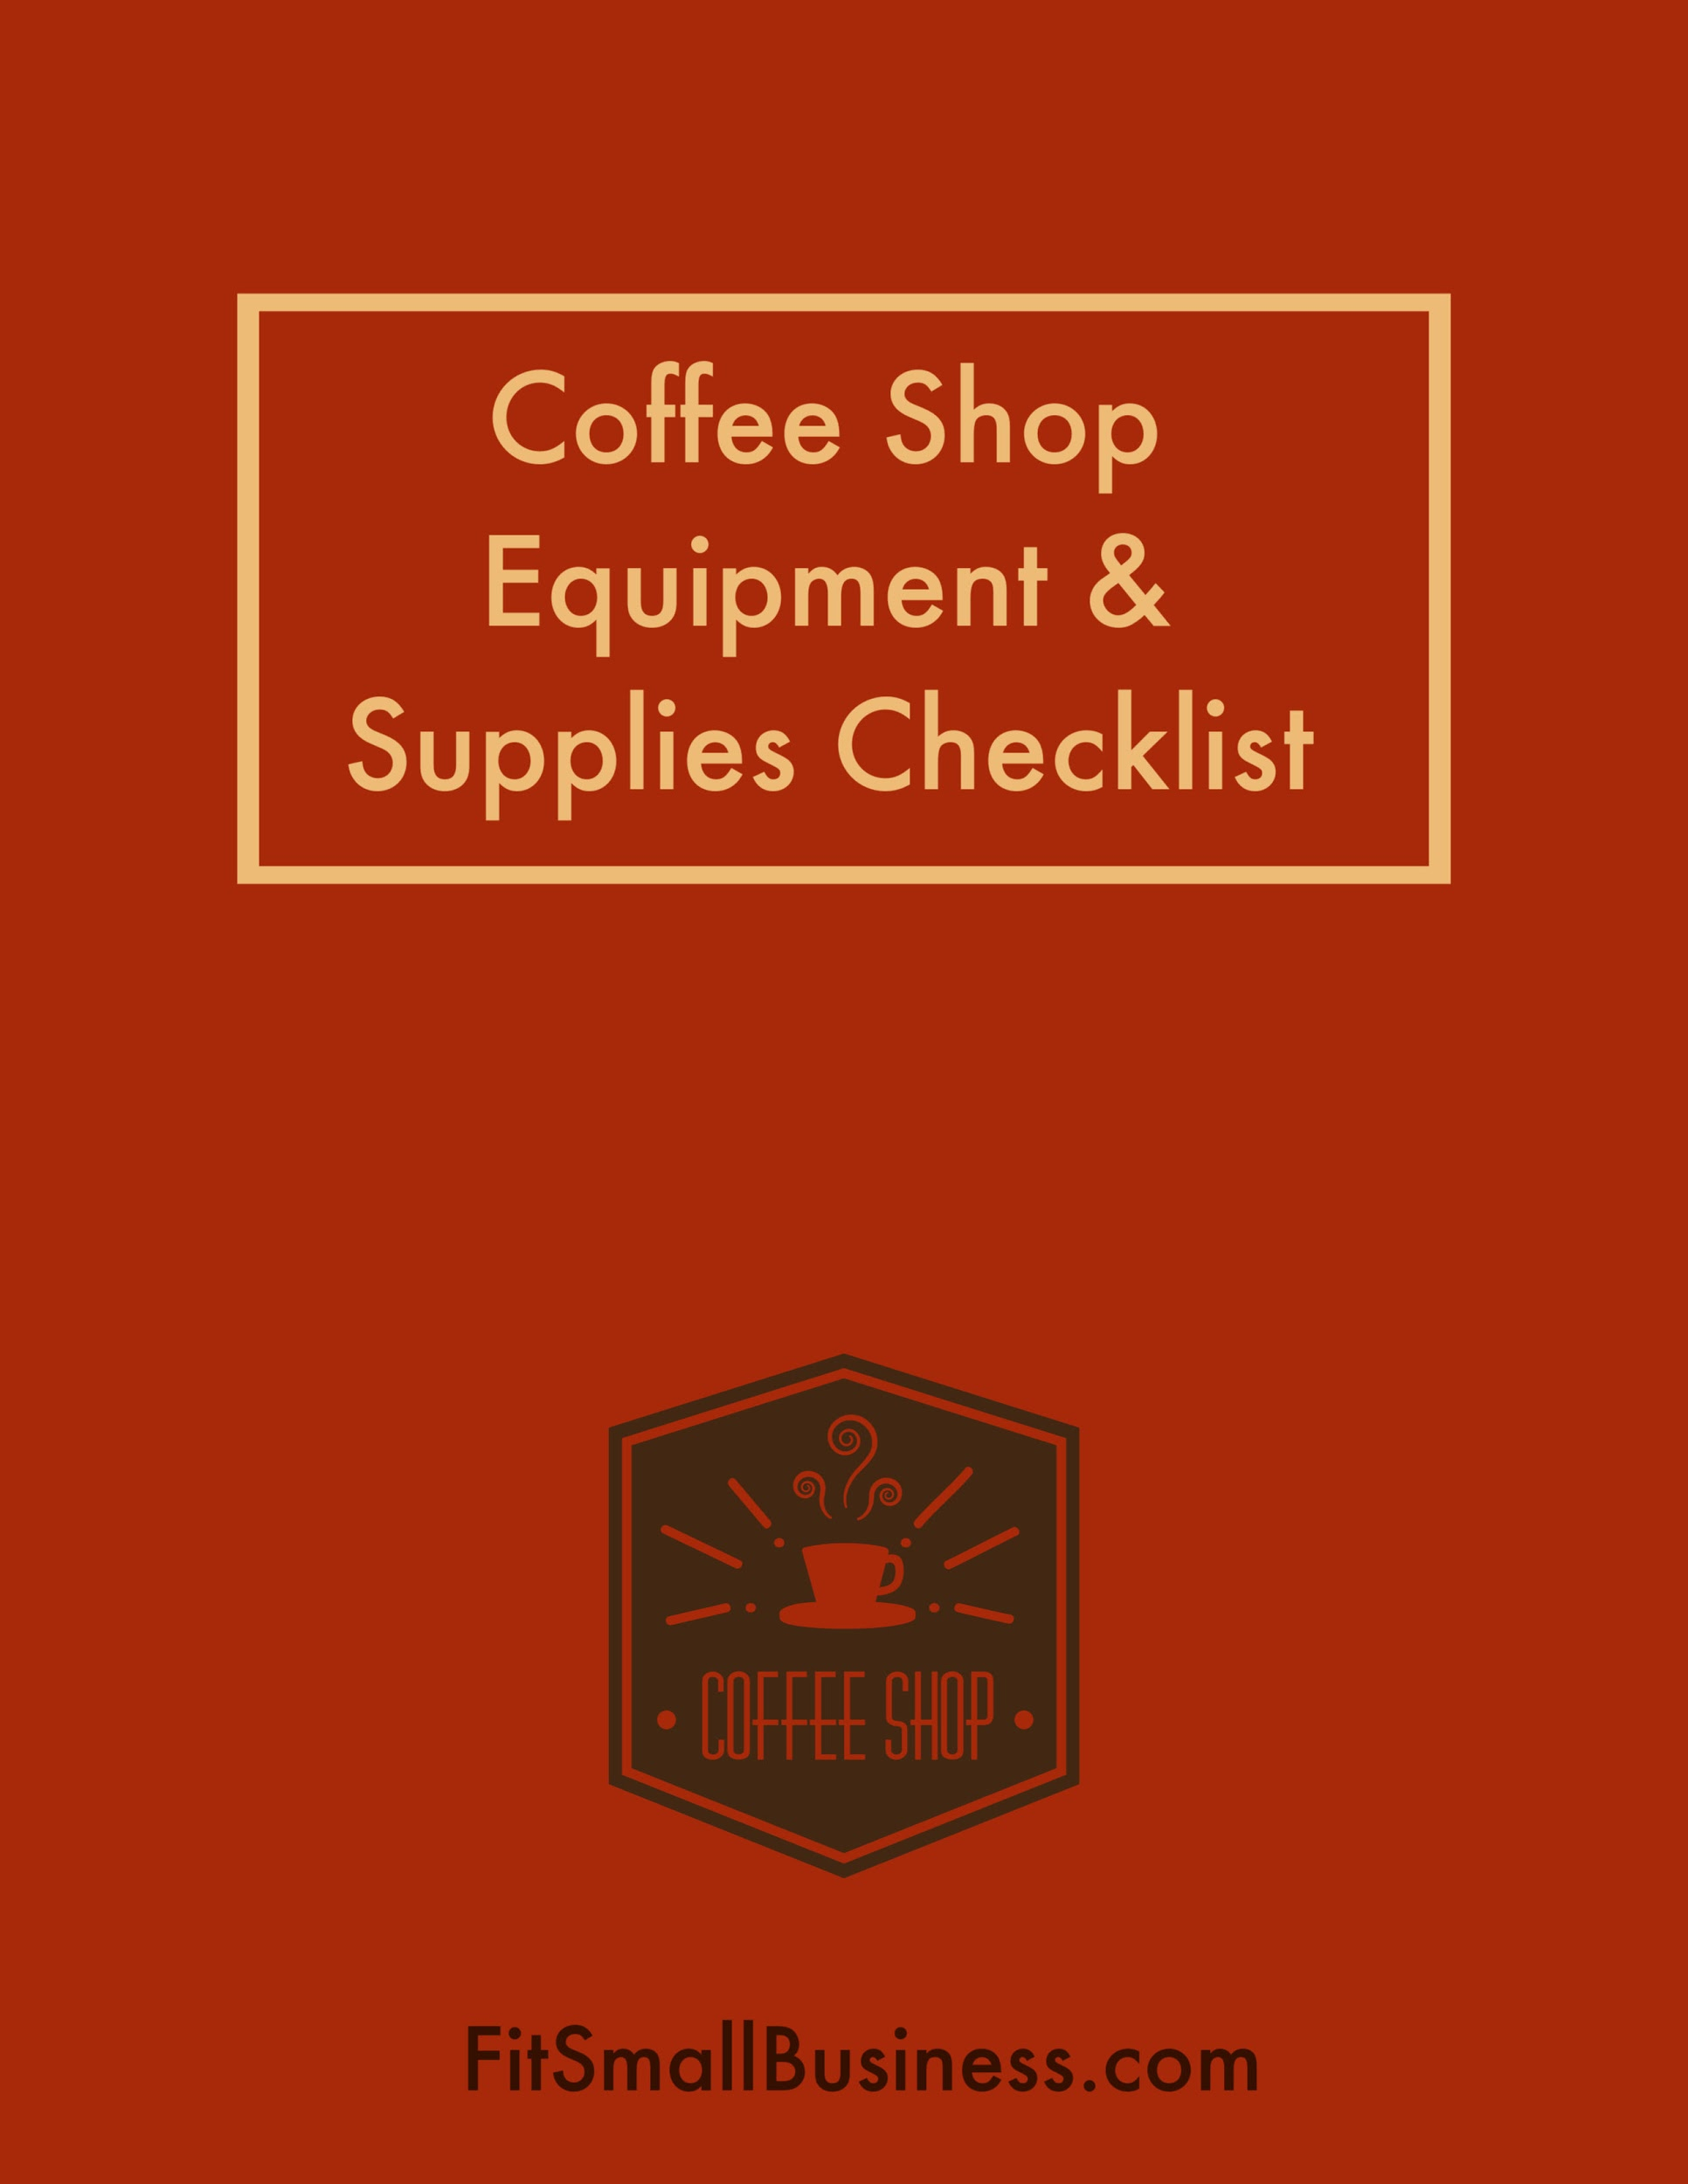 Coffee Shop Equipment & Supplies Checklist